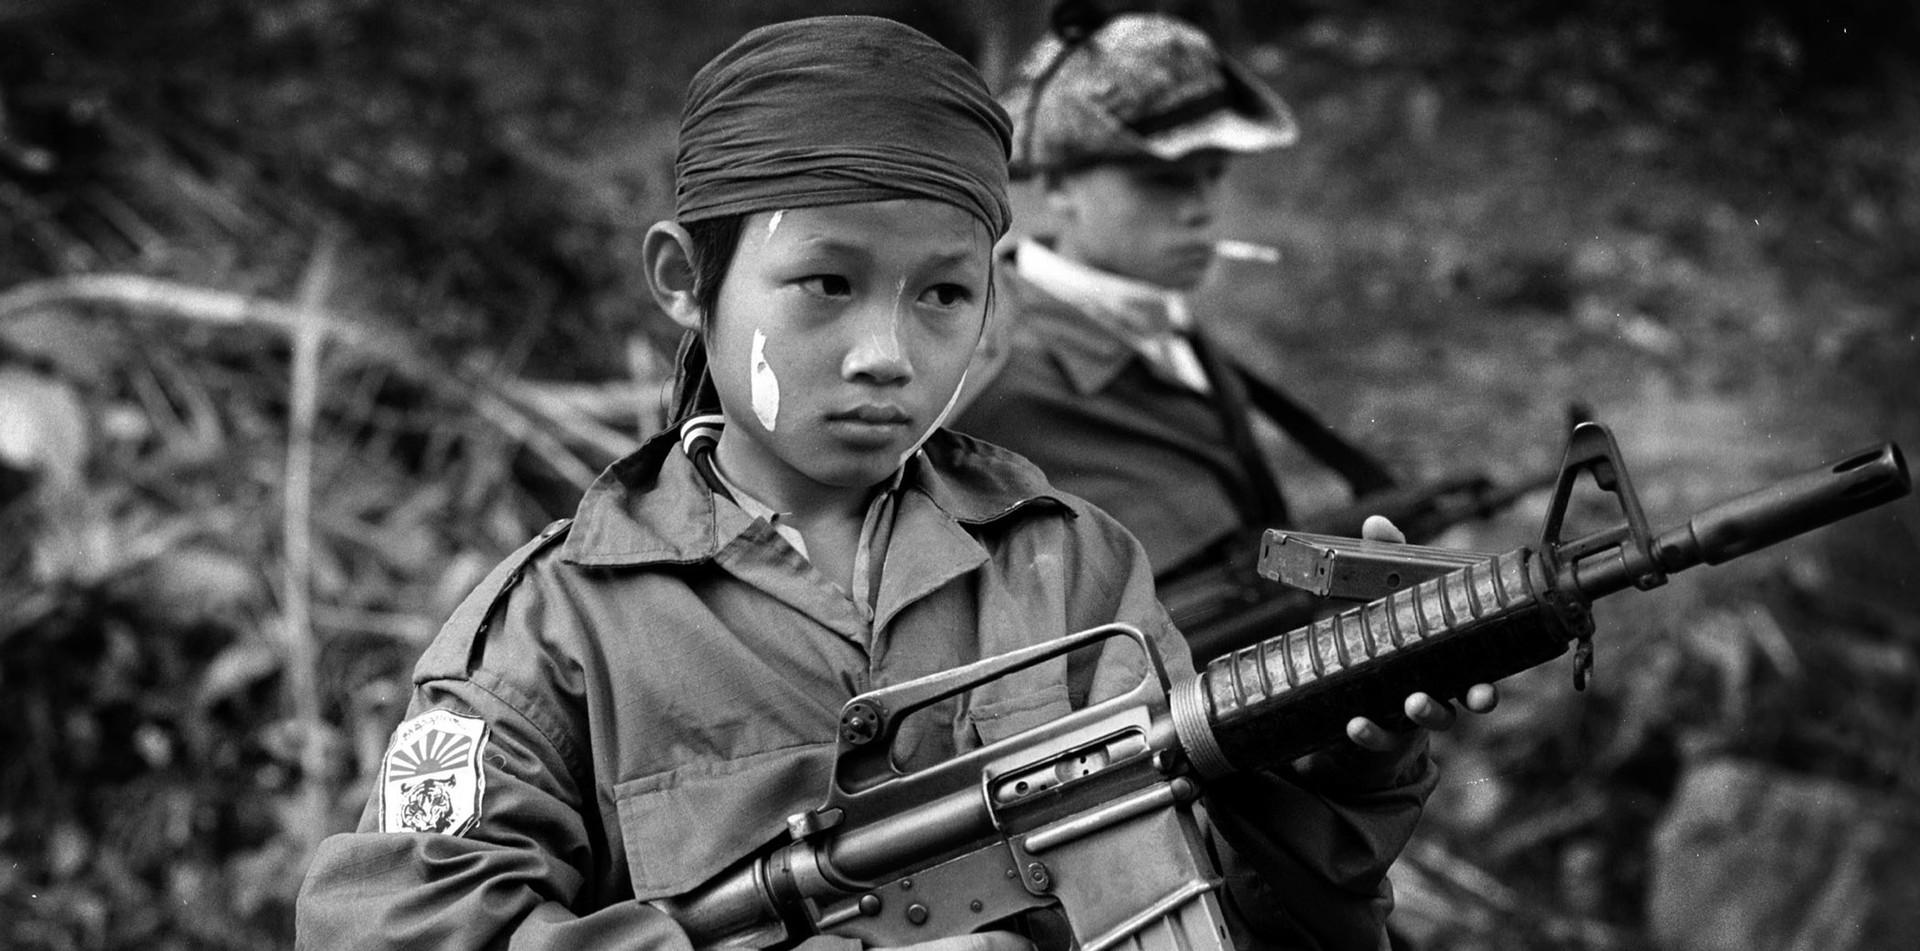 Ten year old Karen soldier. 2000